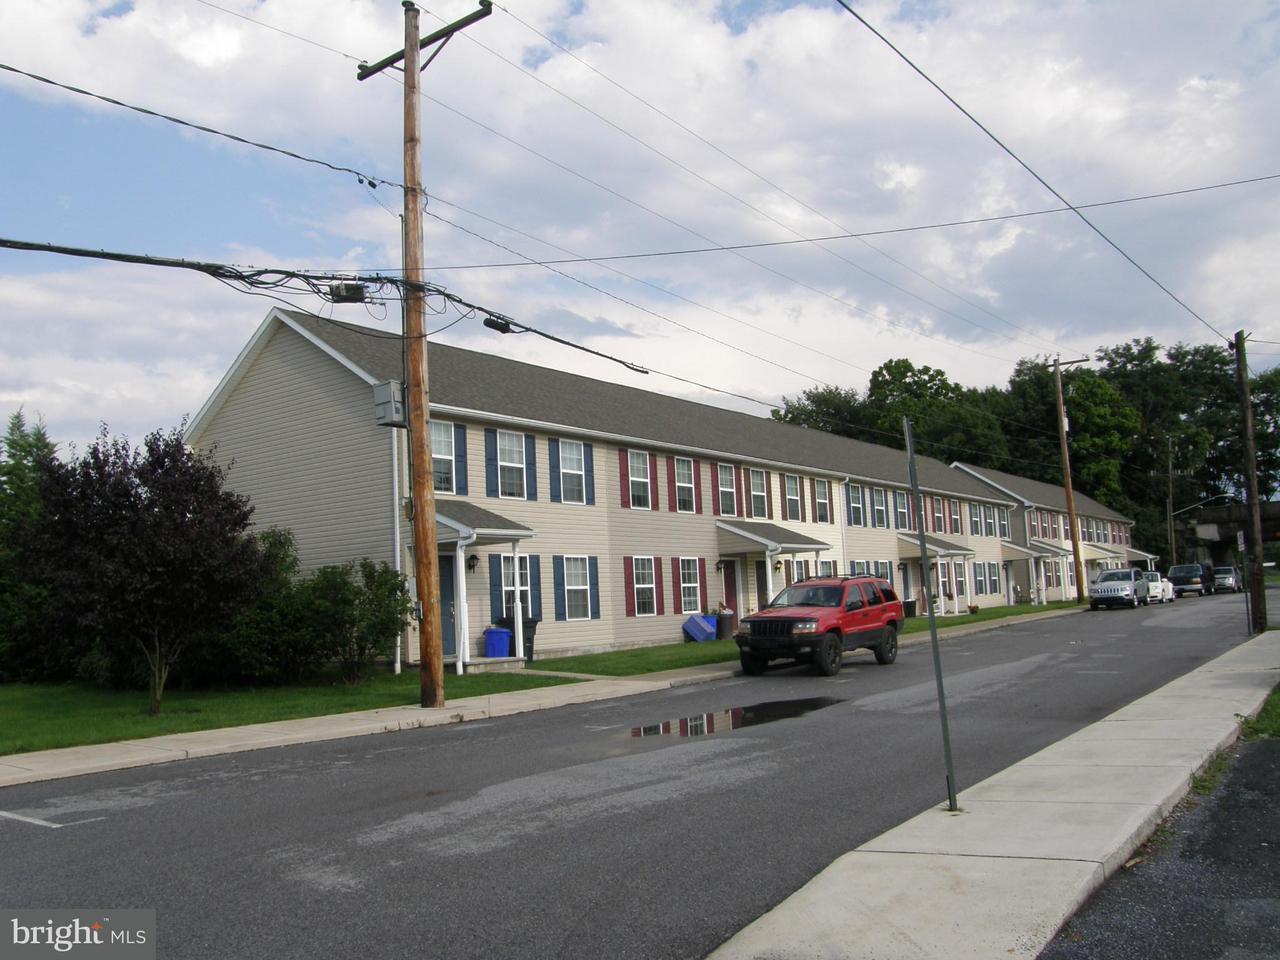 多戶家庭房屋 為 出售 在 121-147 SENECA - EARL ST S 121-147 SENECA - EARL ST S Shippensburg, 賓夕法尼亞州 17257 美國